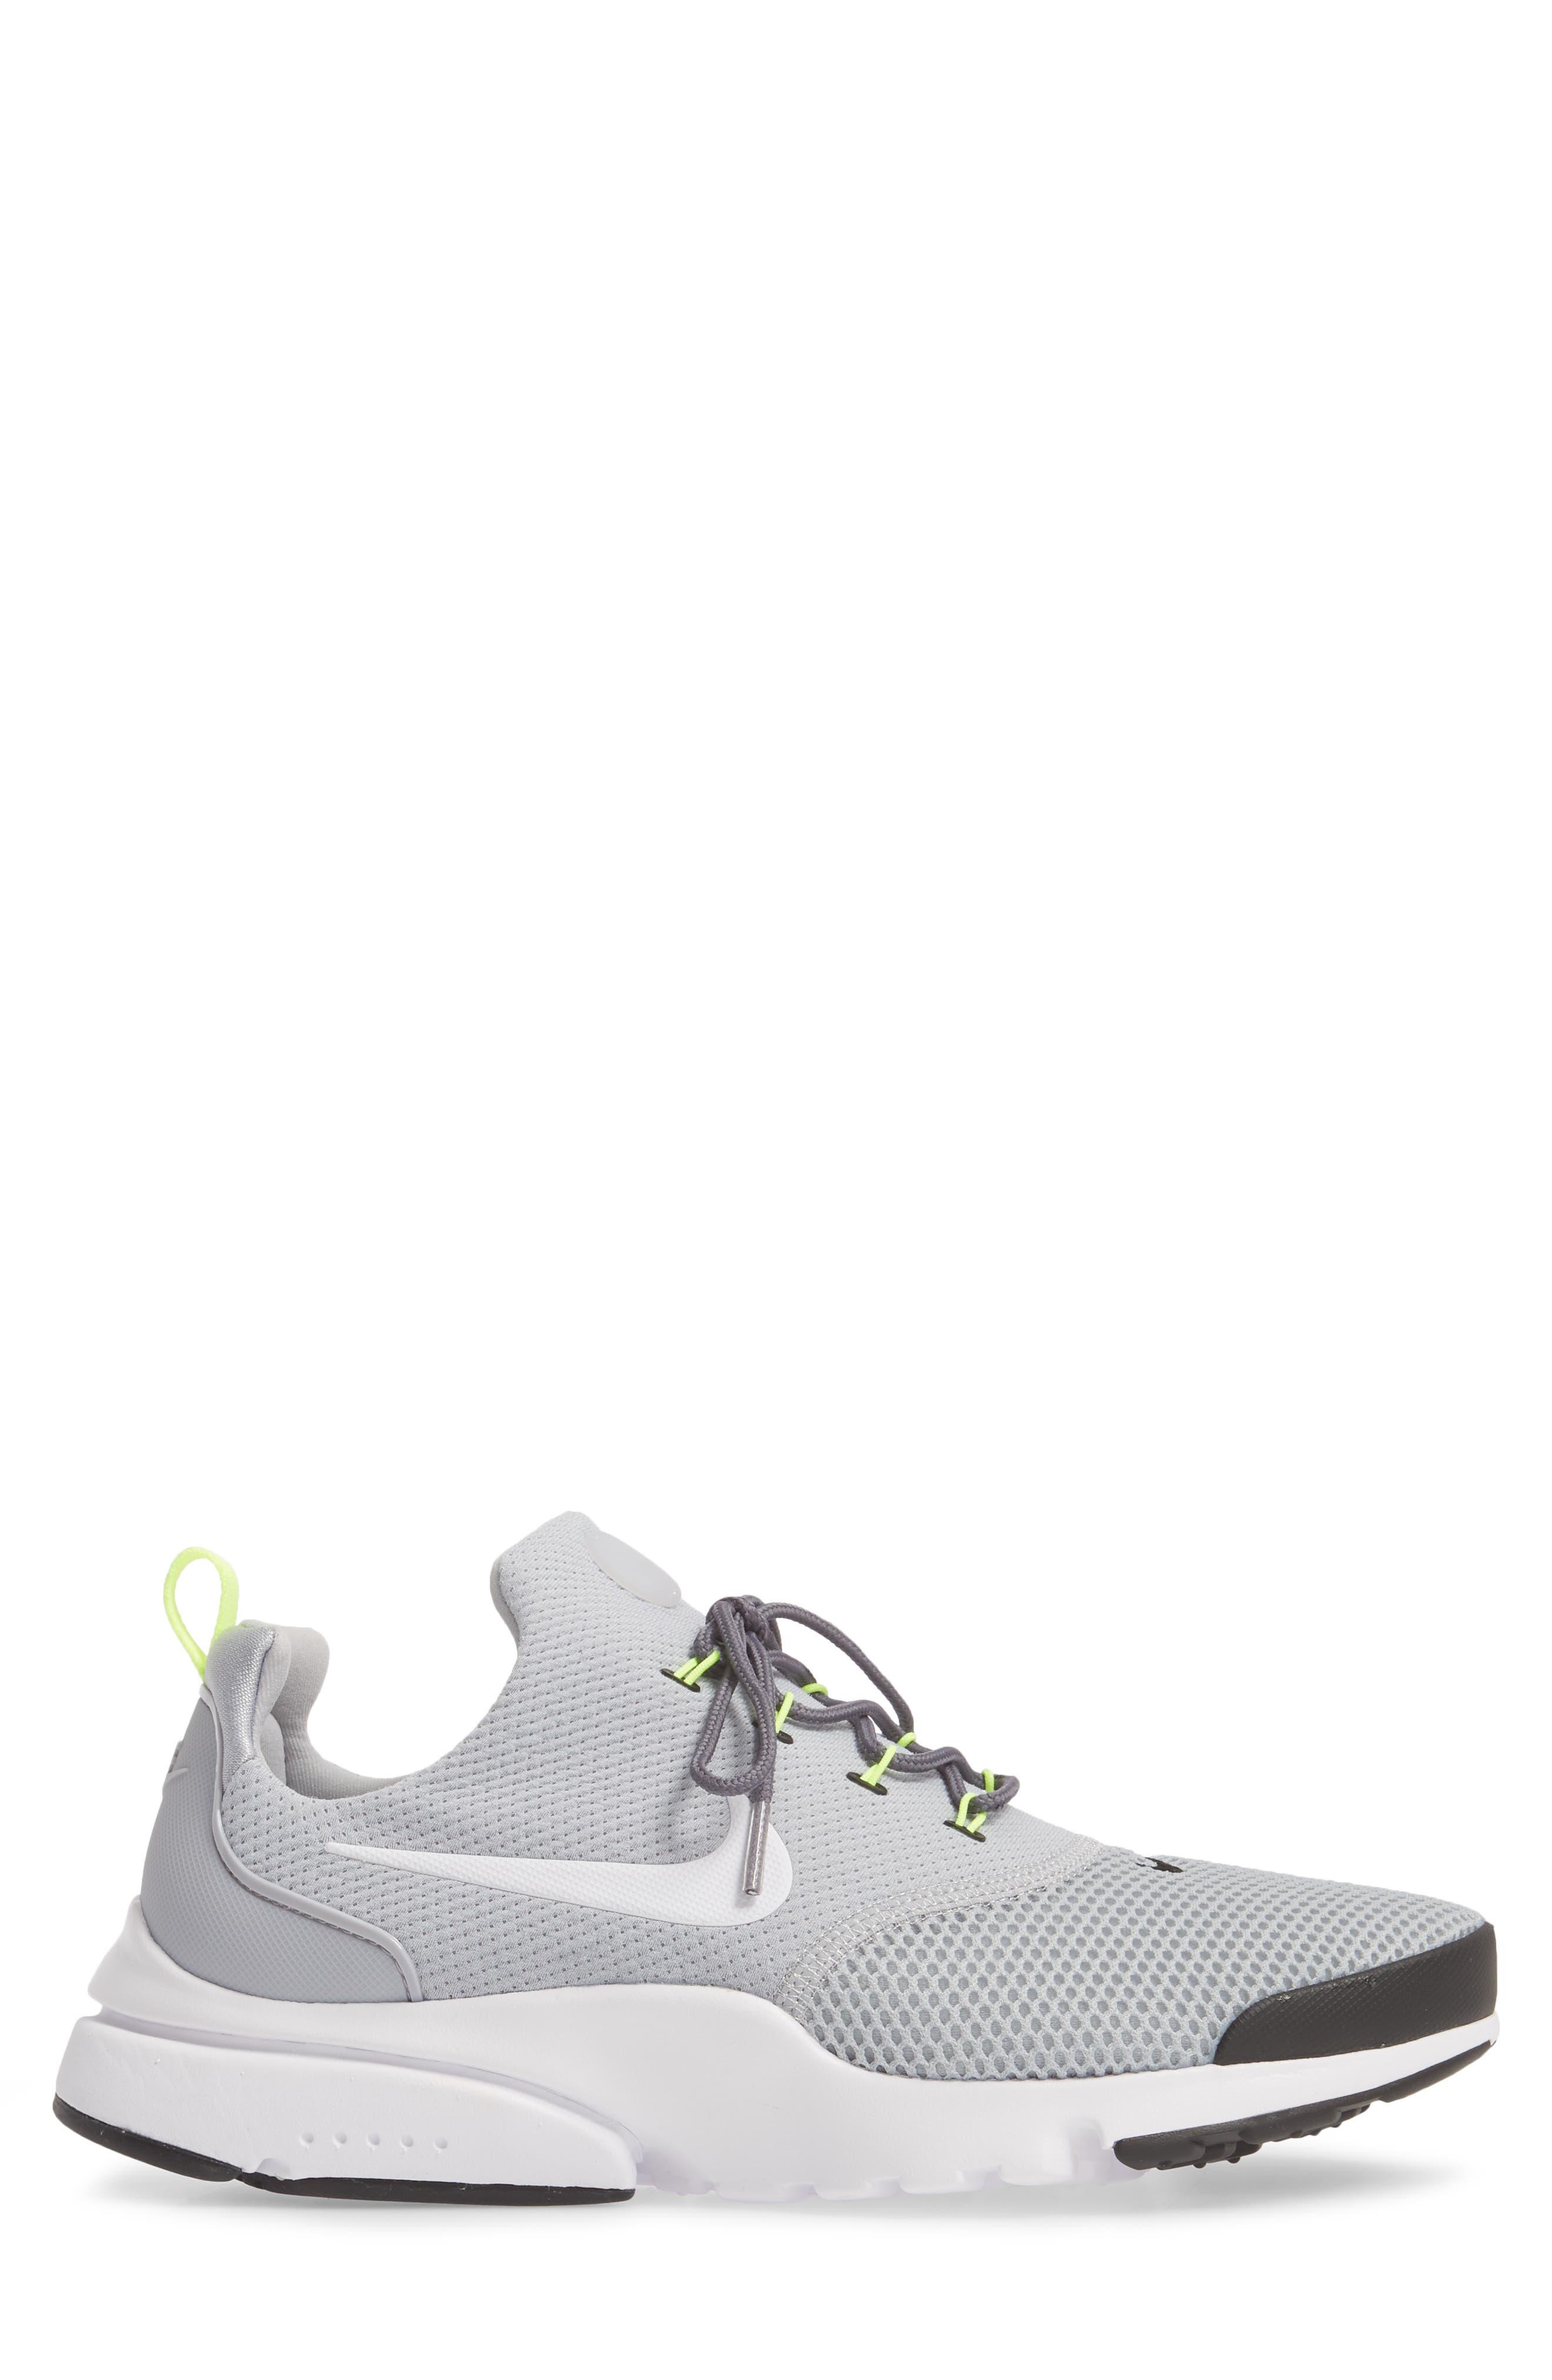 Presto Fly Sneaker,                             Alternate thumbnail 3, color,                             Wolf Grey/ White/ Volt